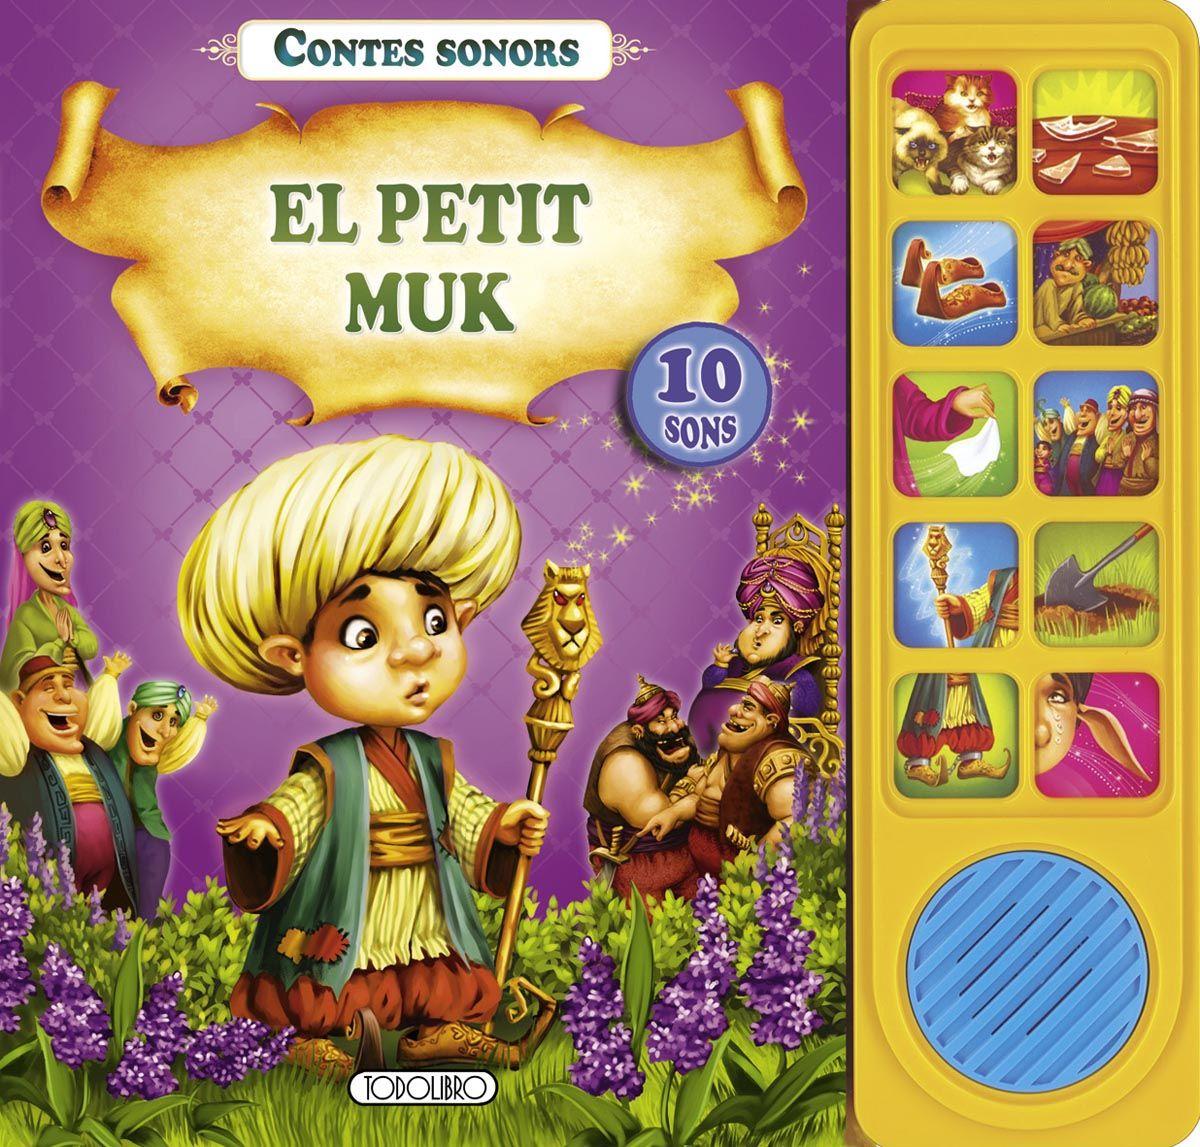 PETIT MUK,EL (CONTES SONORS)